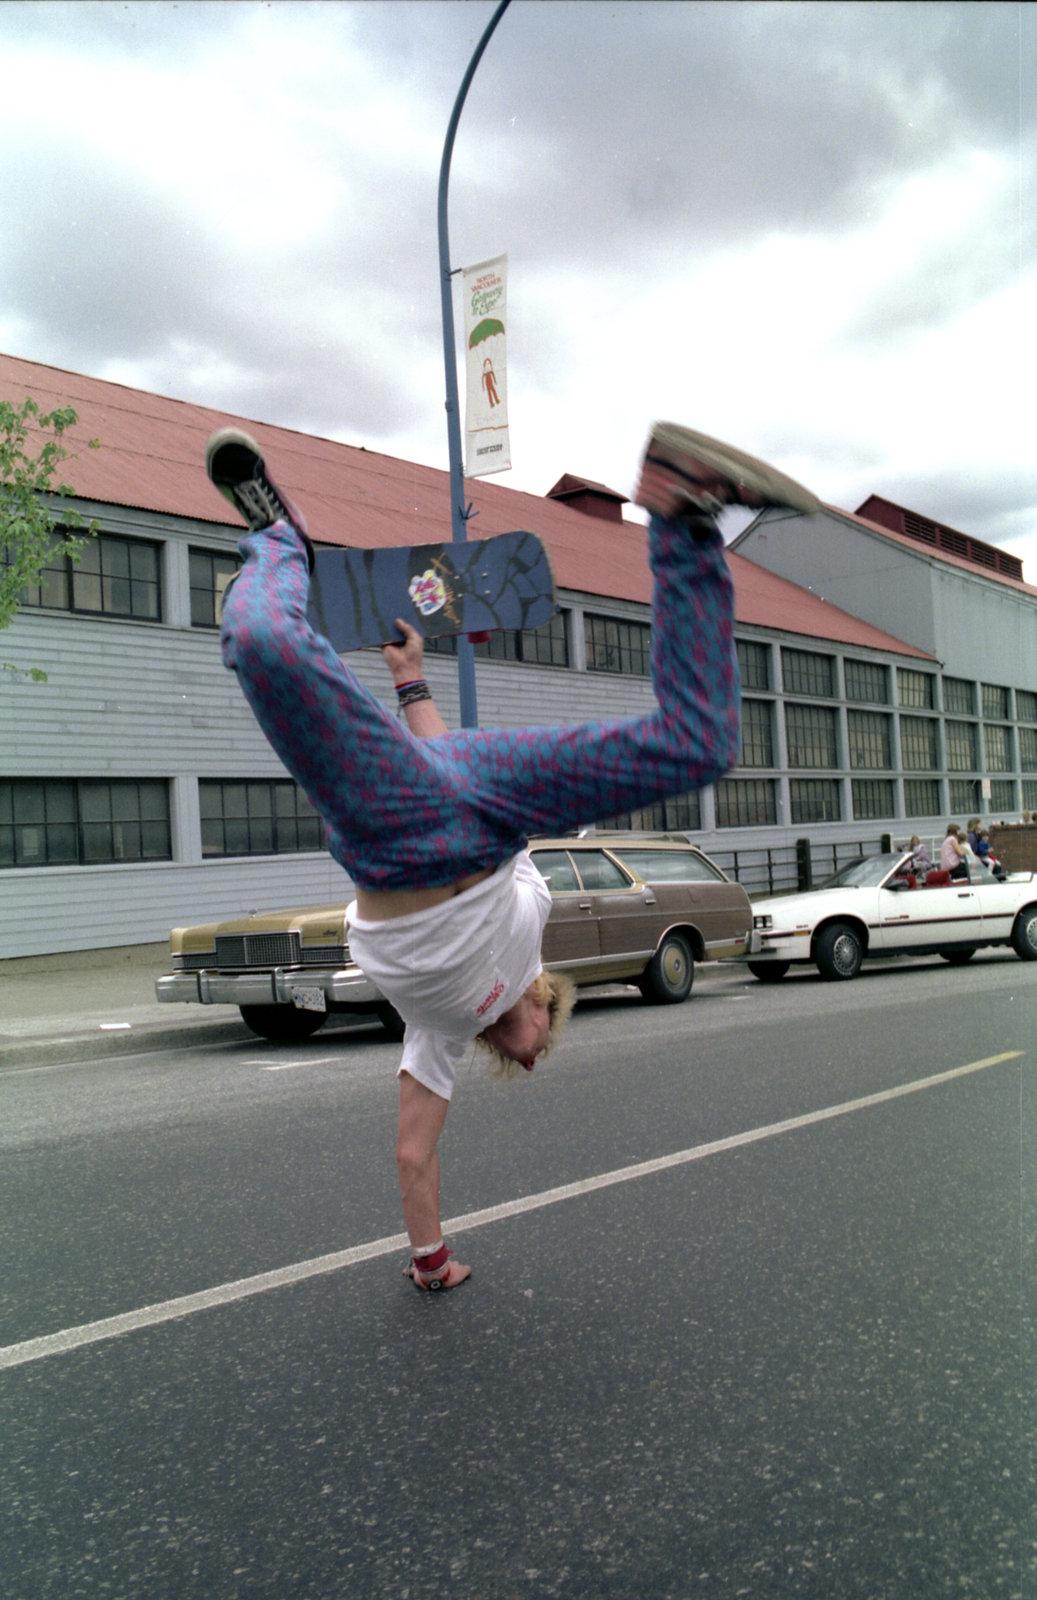 Craig-HandPlant-outside-California-Streets-11-Lonsdale.jpg